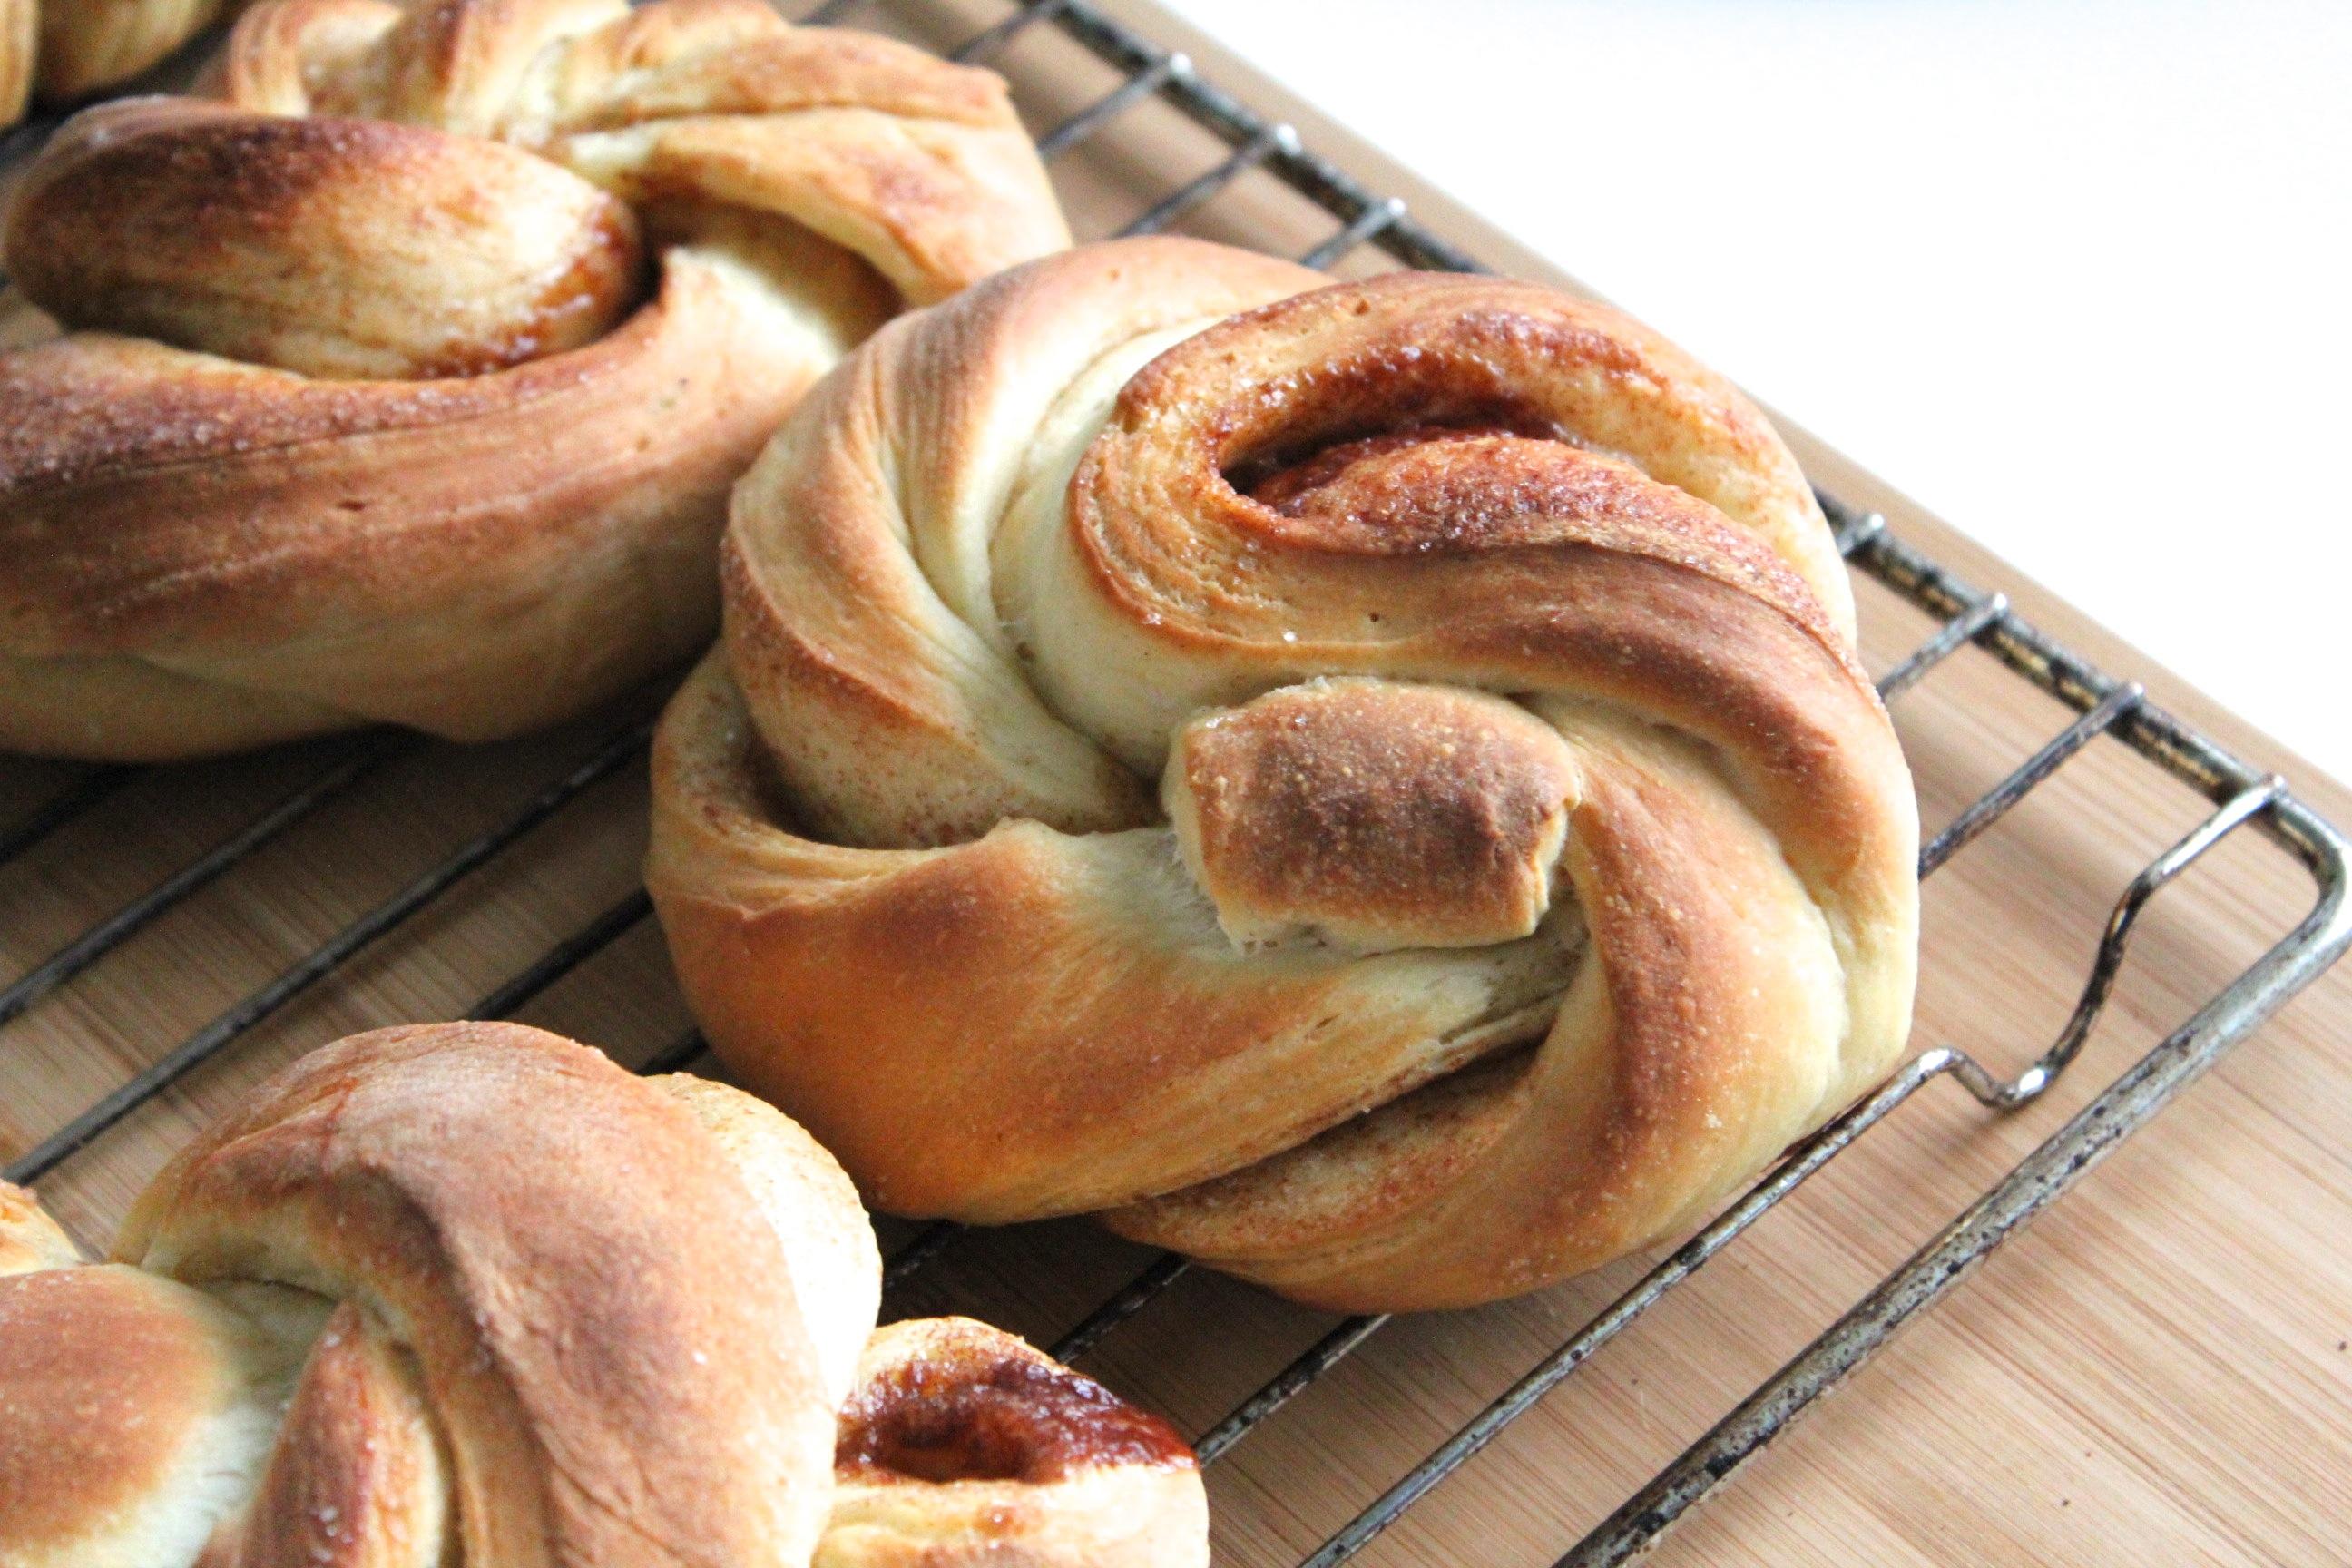 Norwegian Cinnamon Buns – Norsk Kanelboller